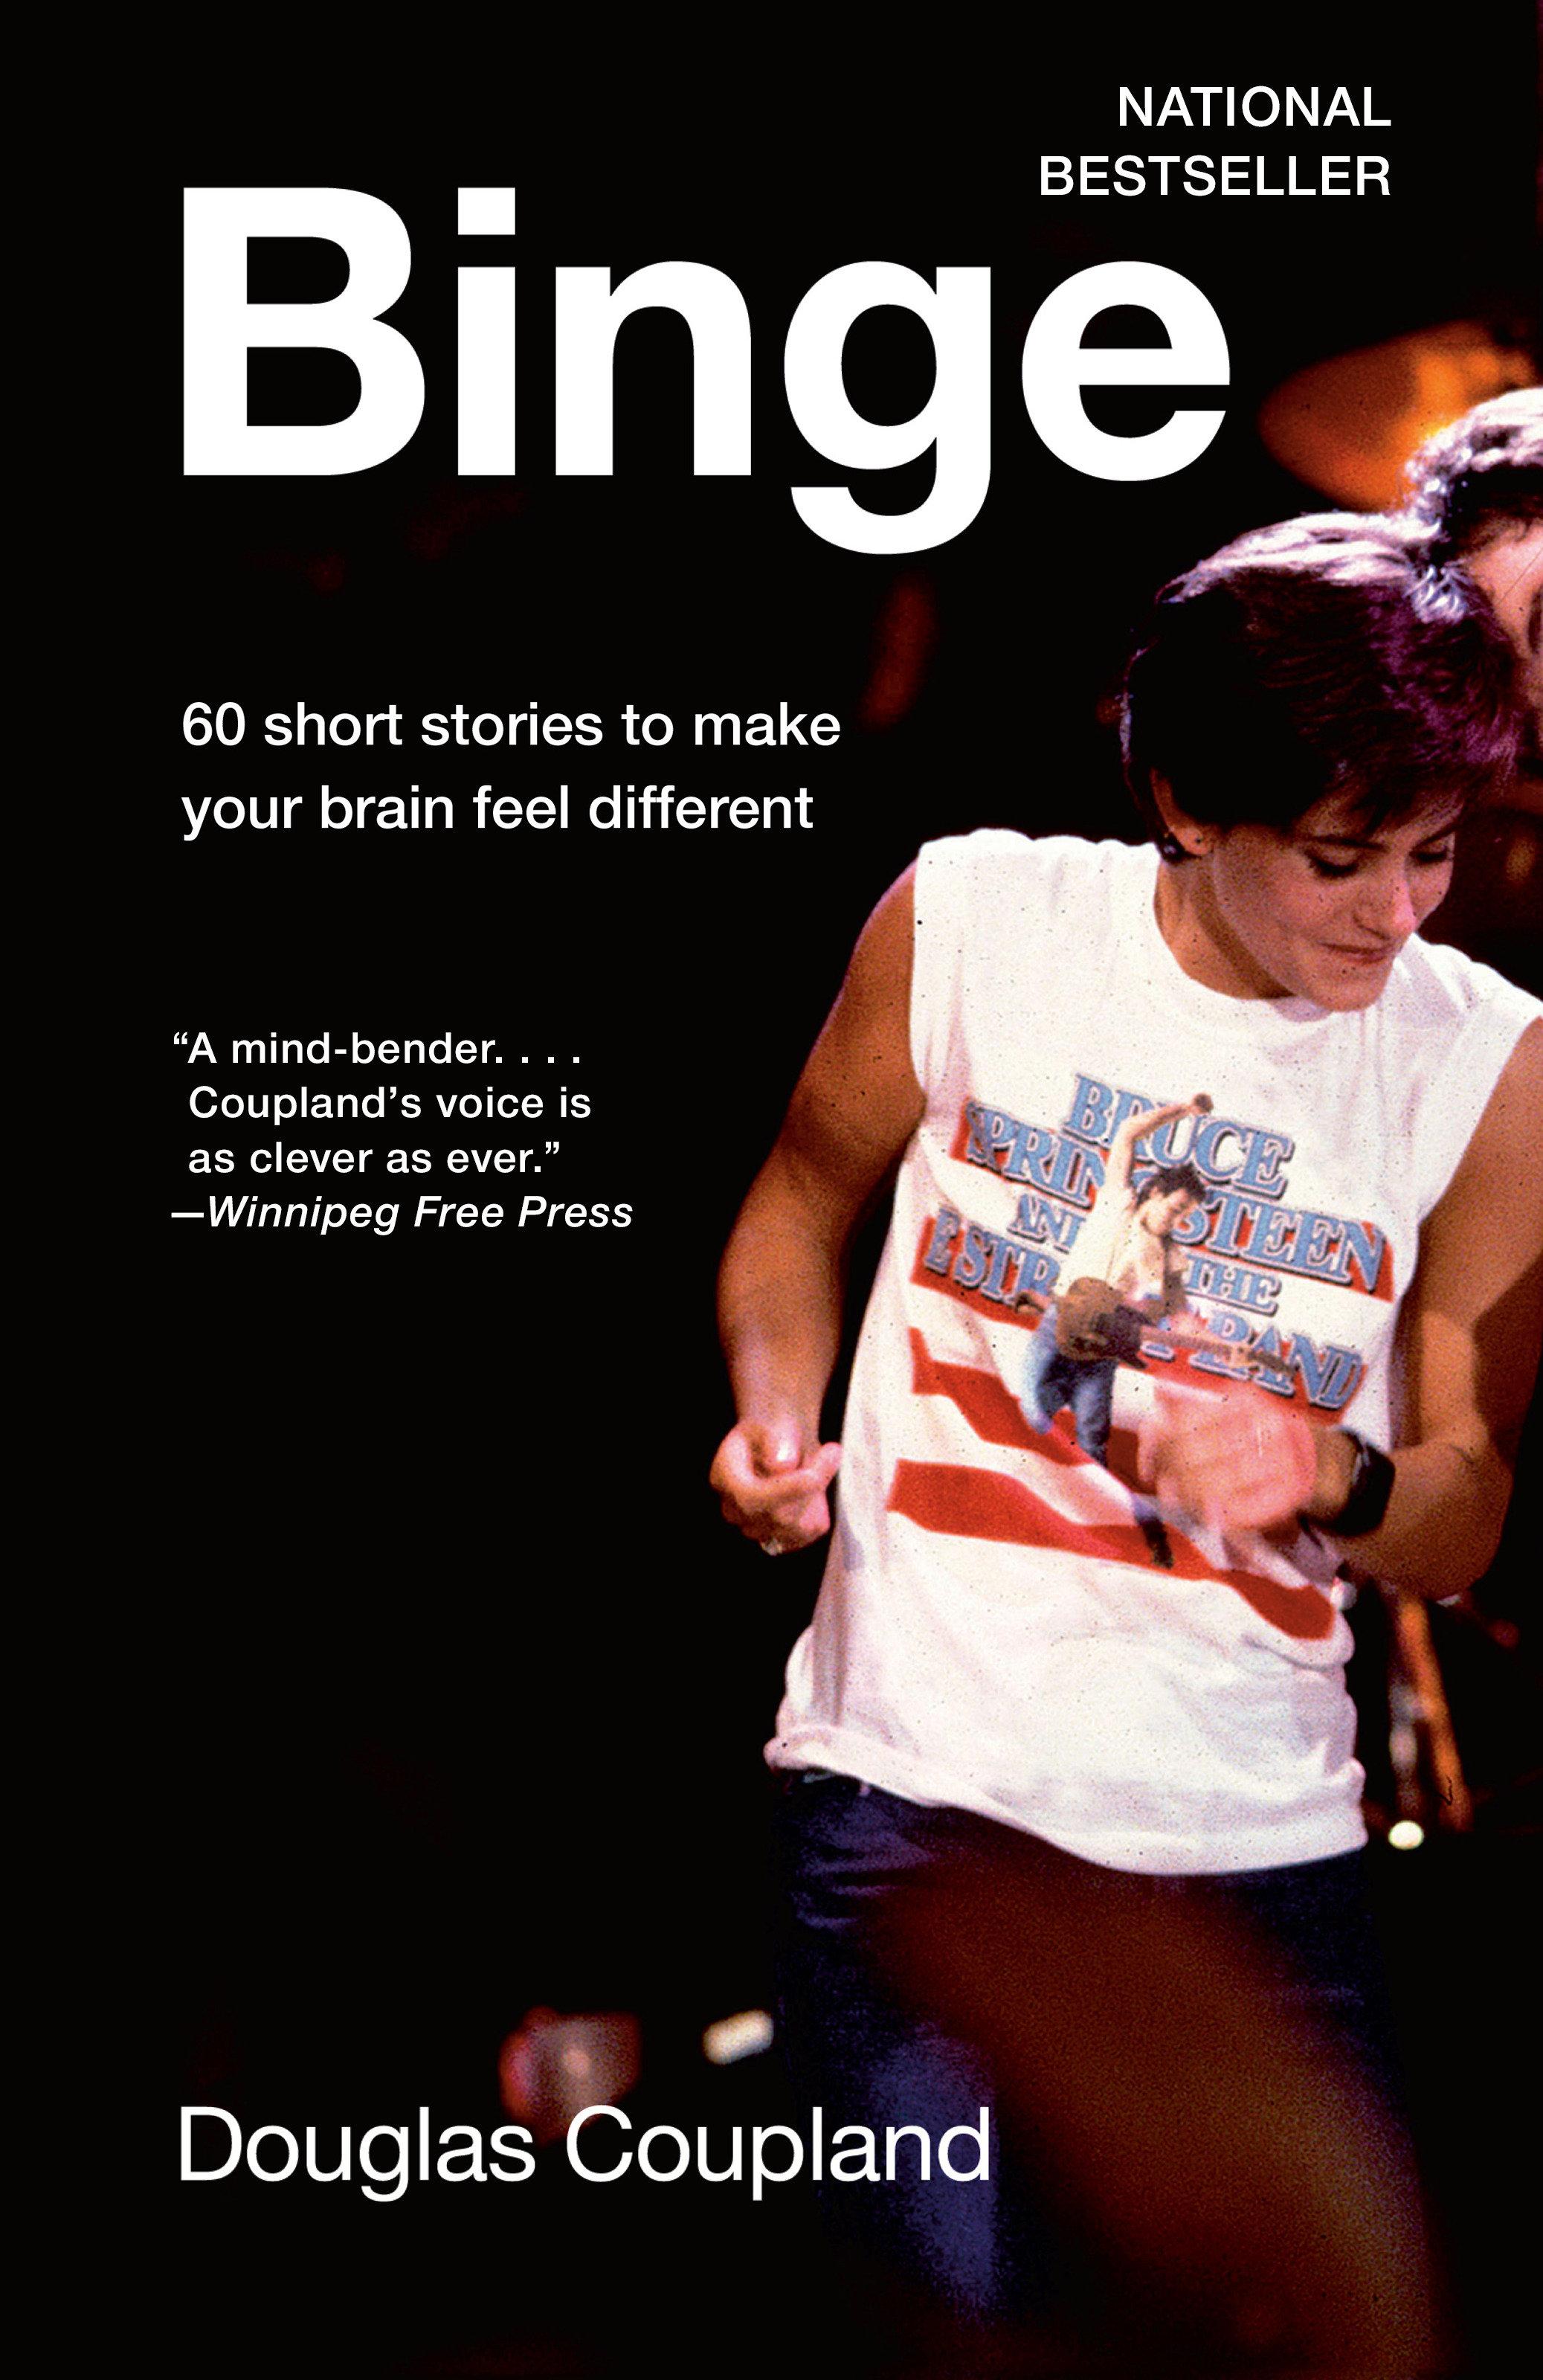 Cover Image of Binge